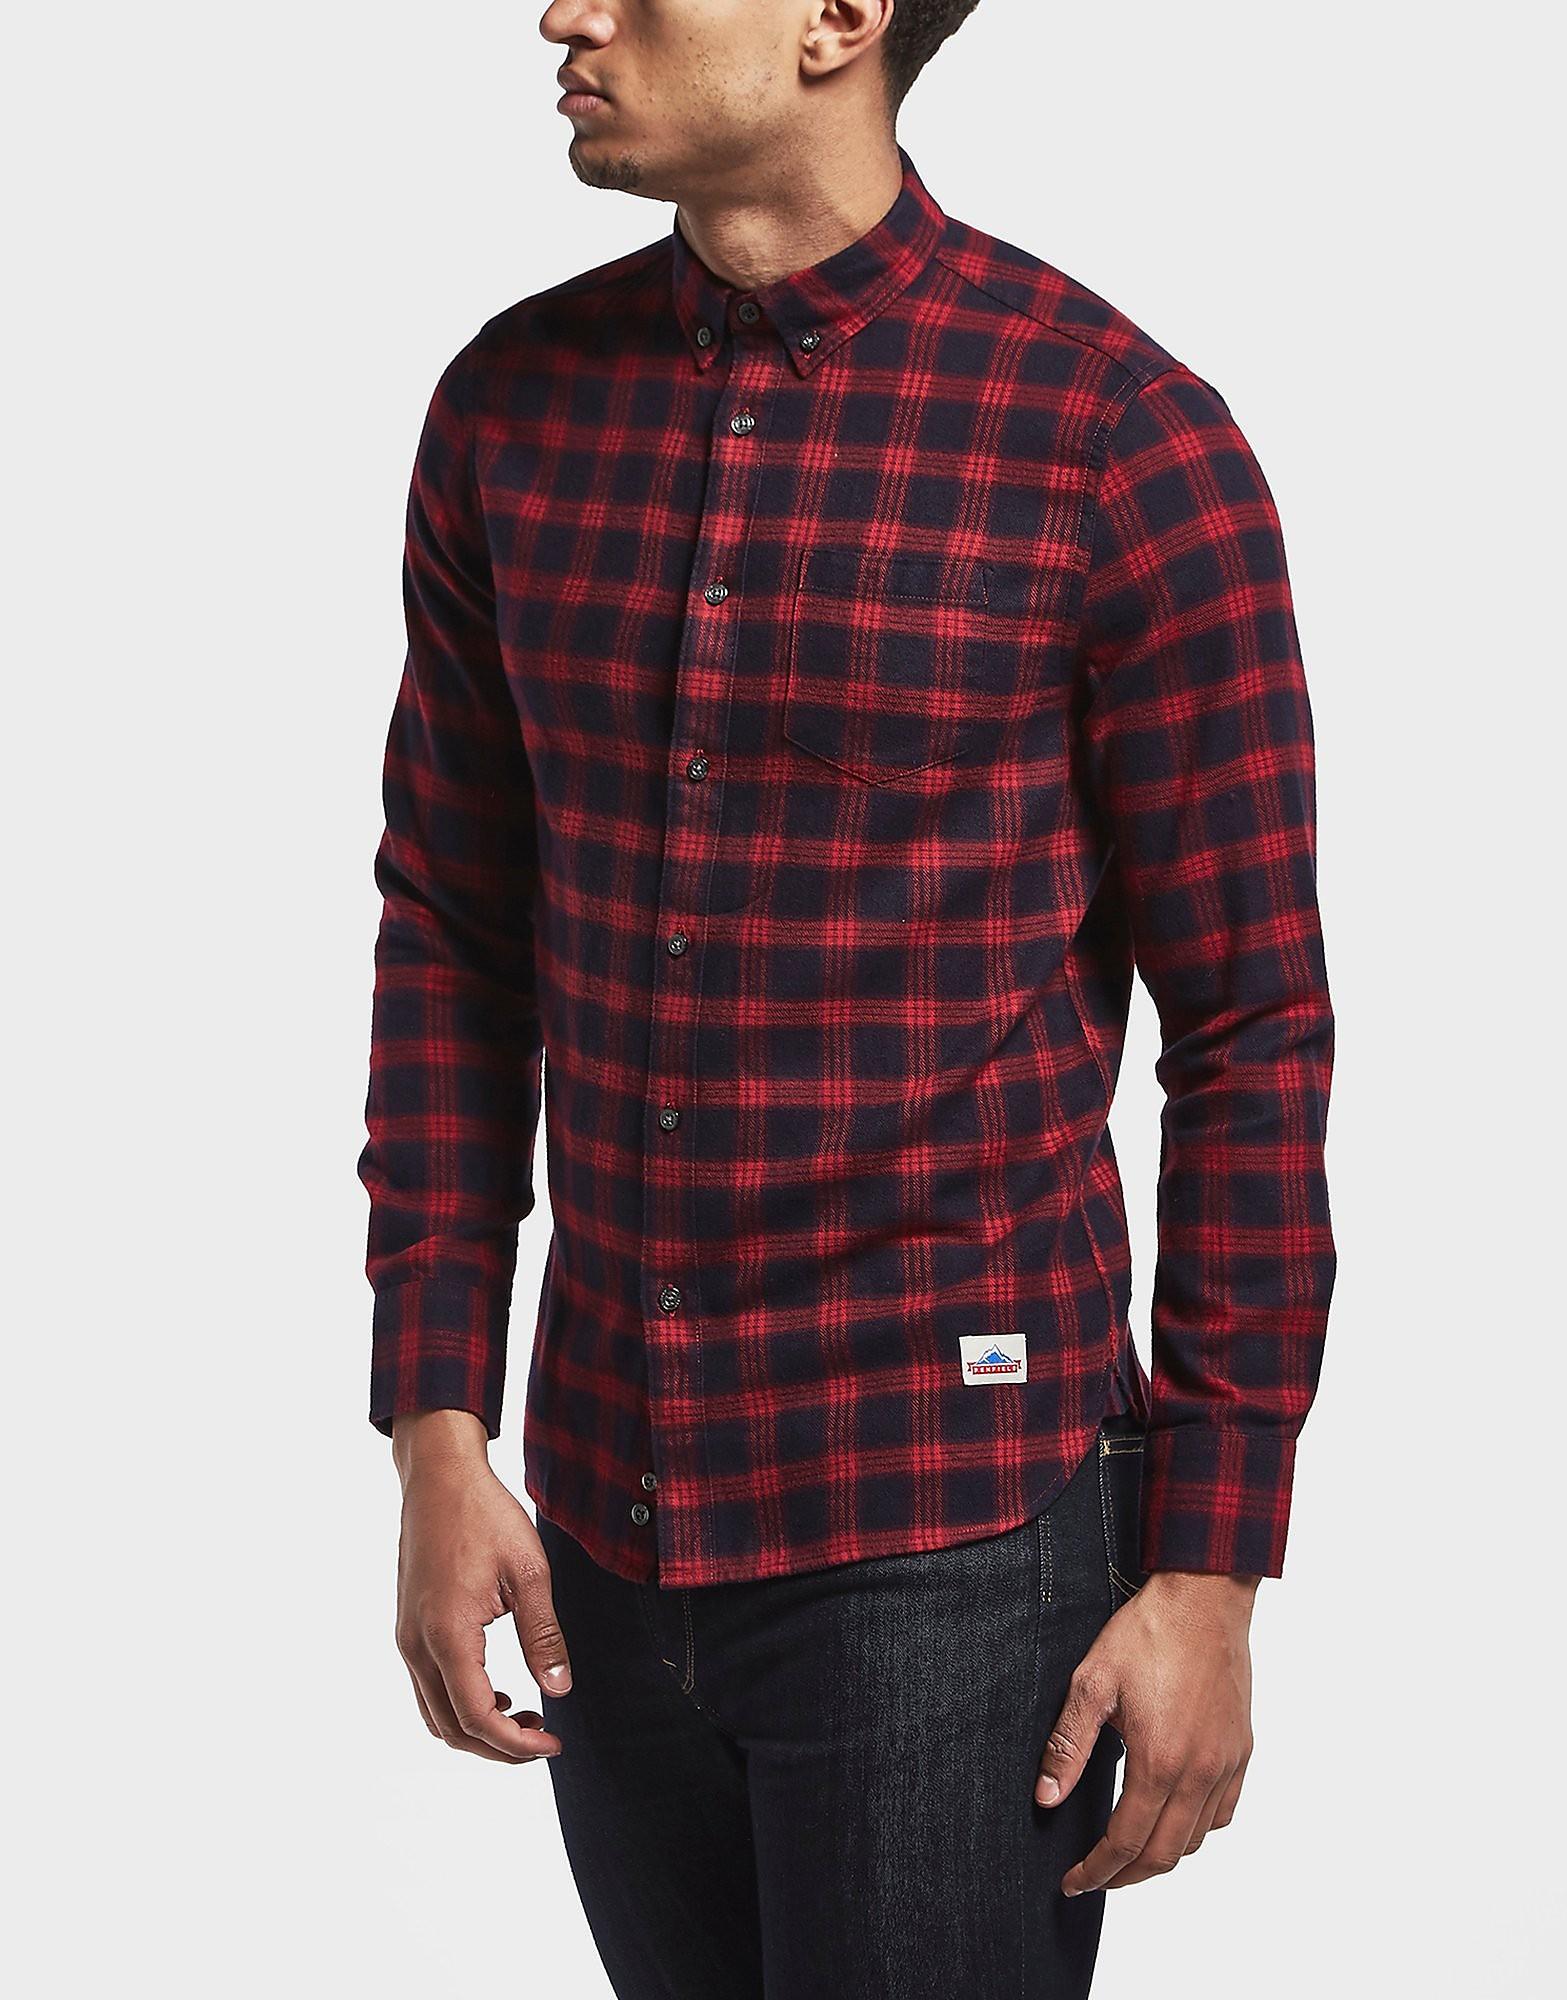 Penfield Corey Check Long Sleeve Shirt